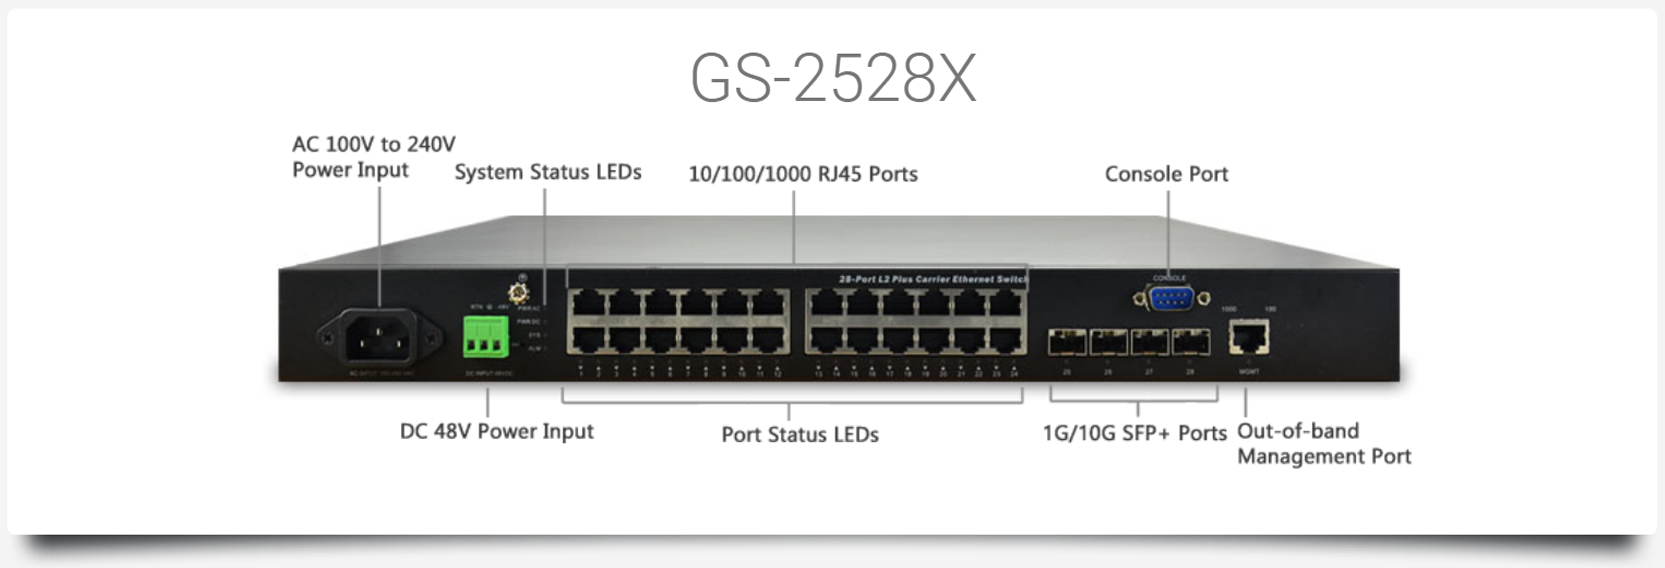 GS-2528X